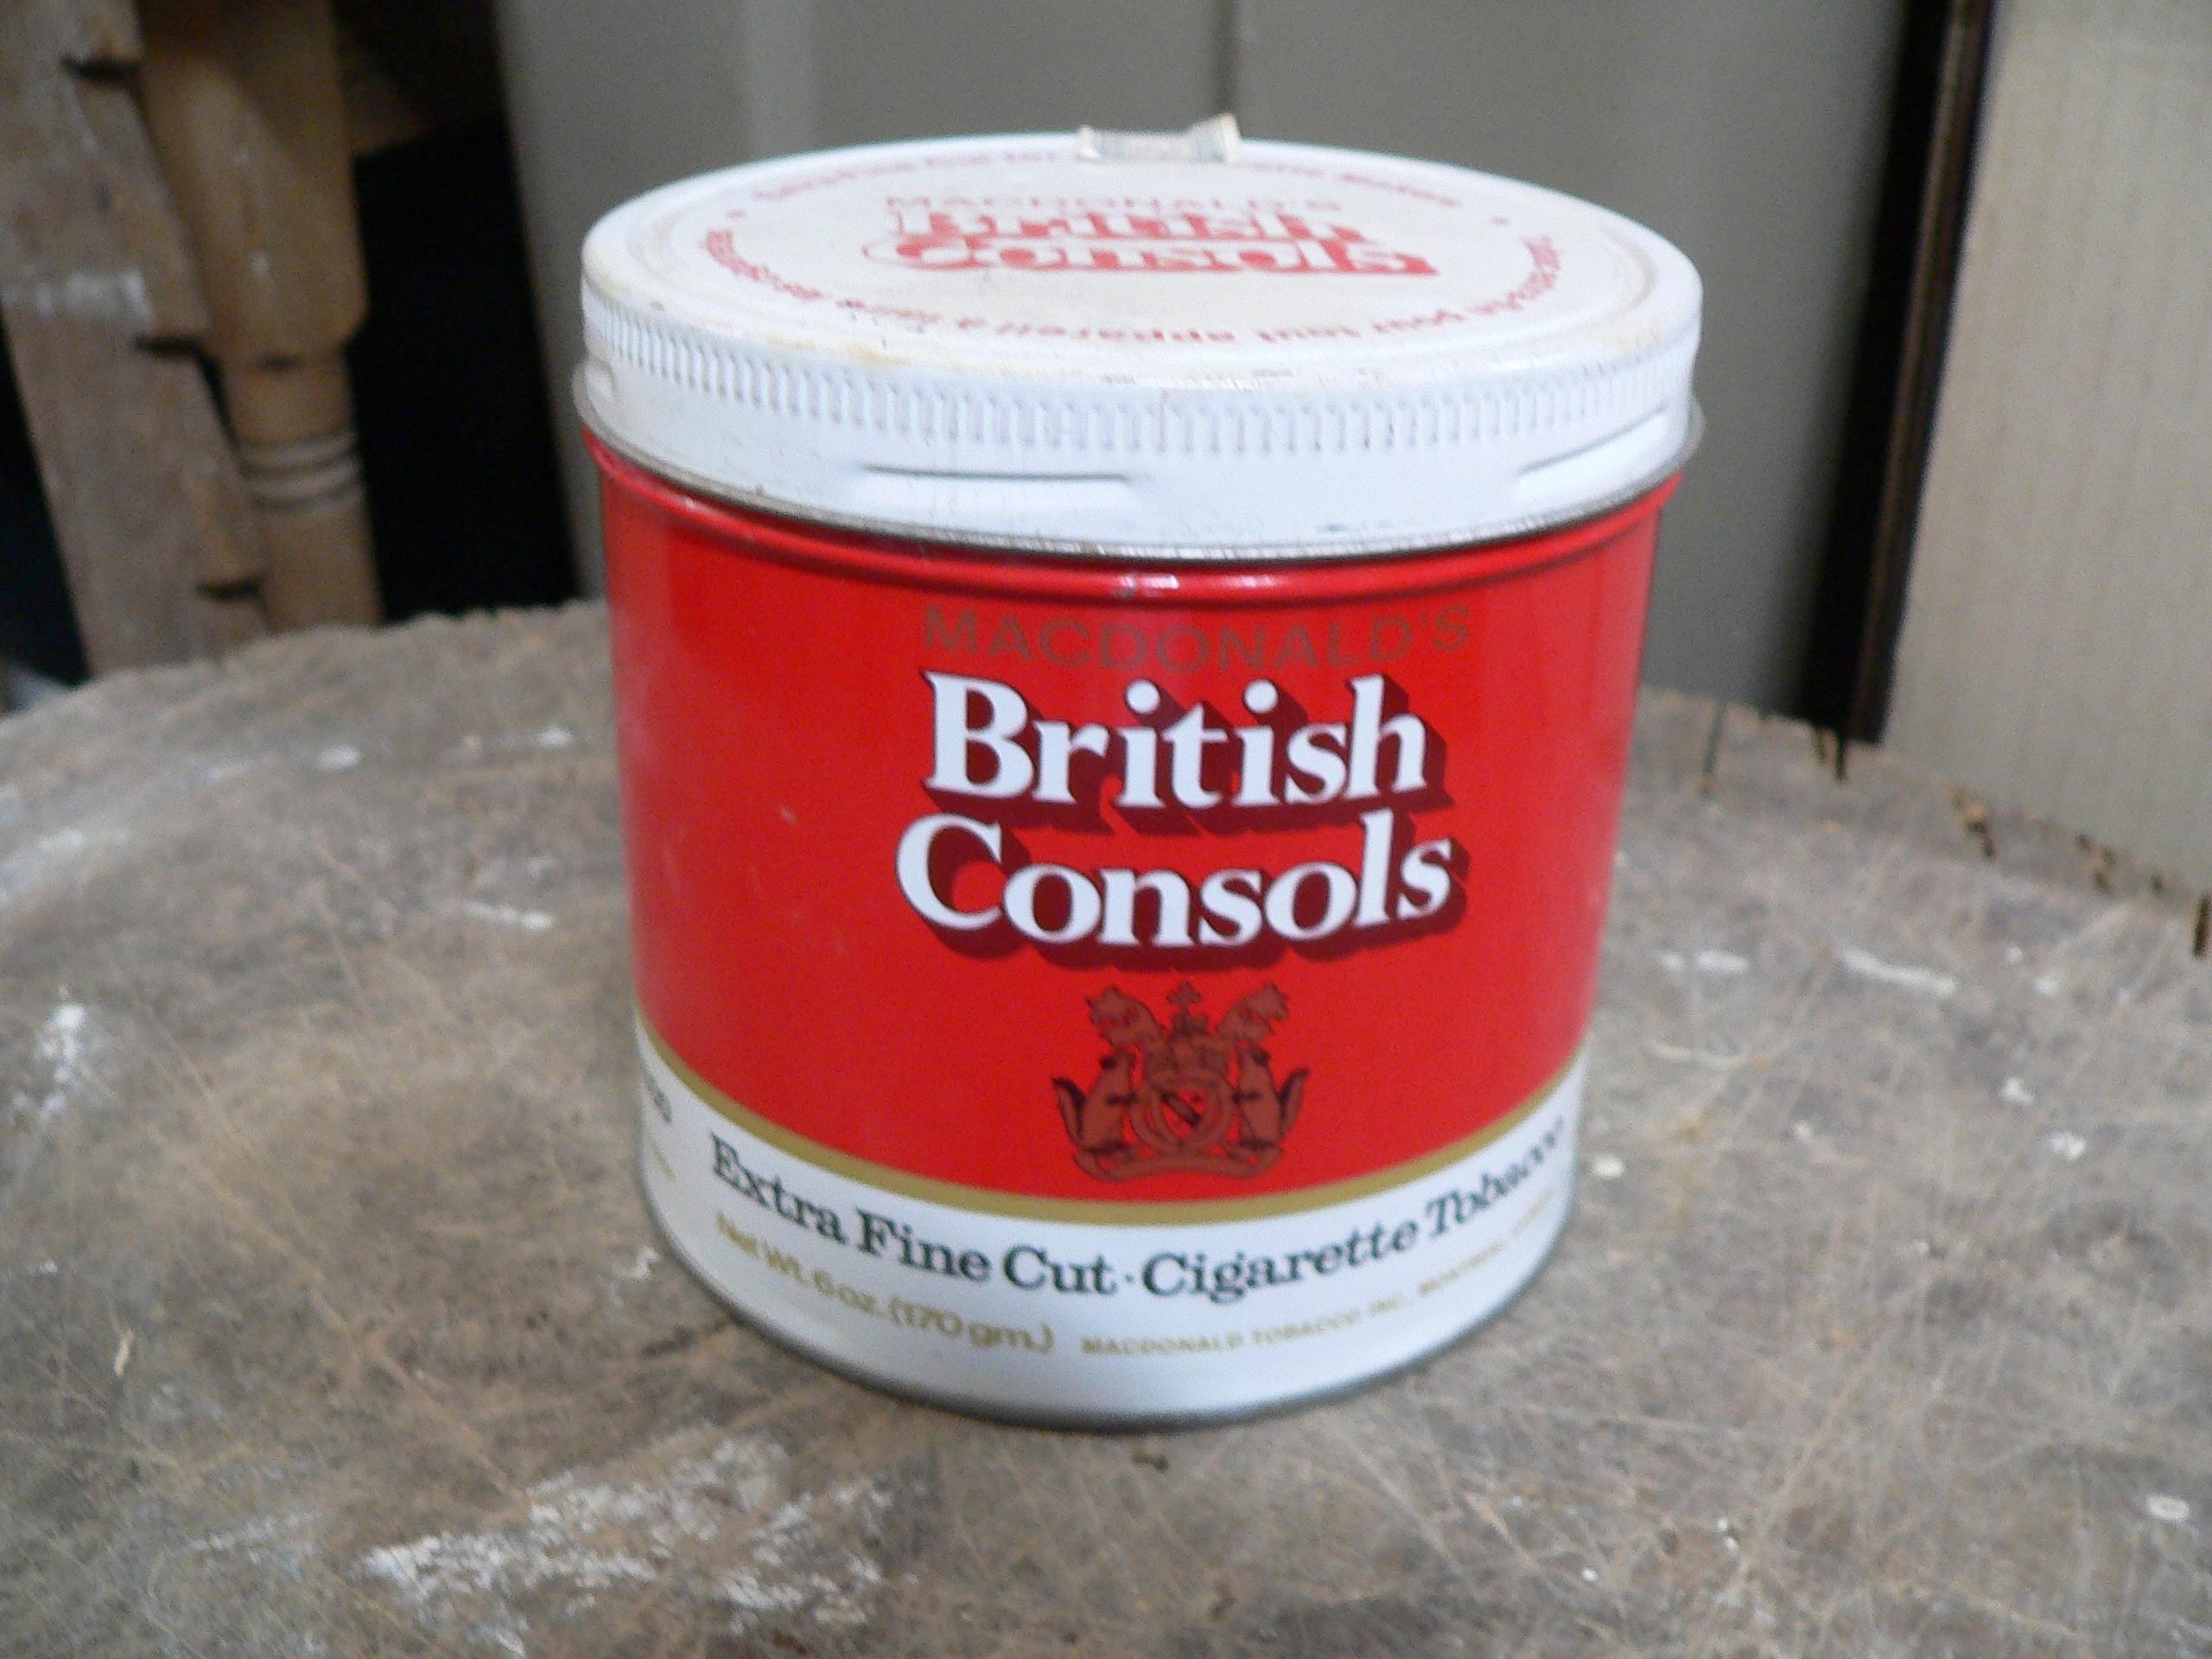 Canne de tabac british consols # 7486.7